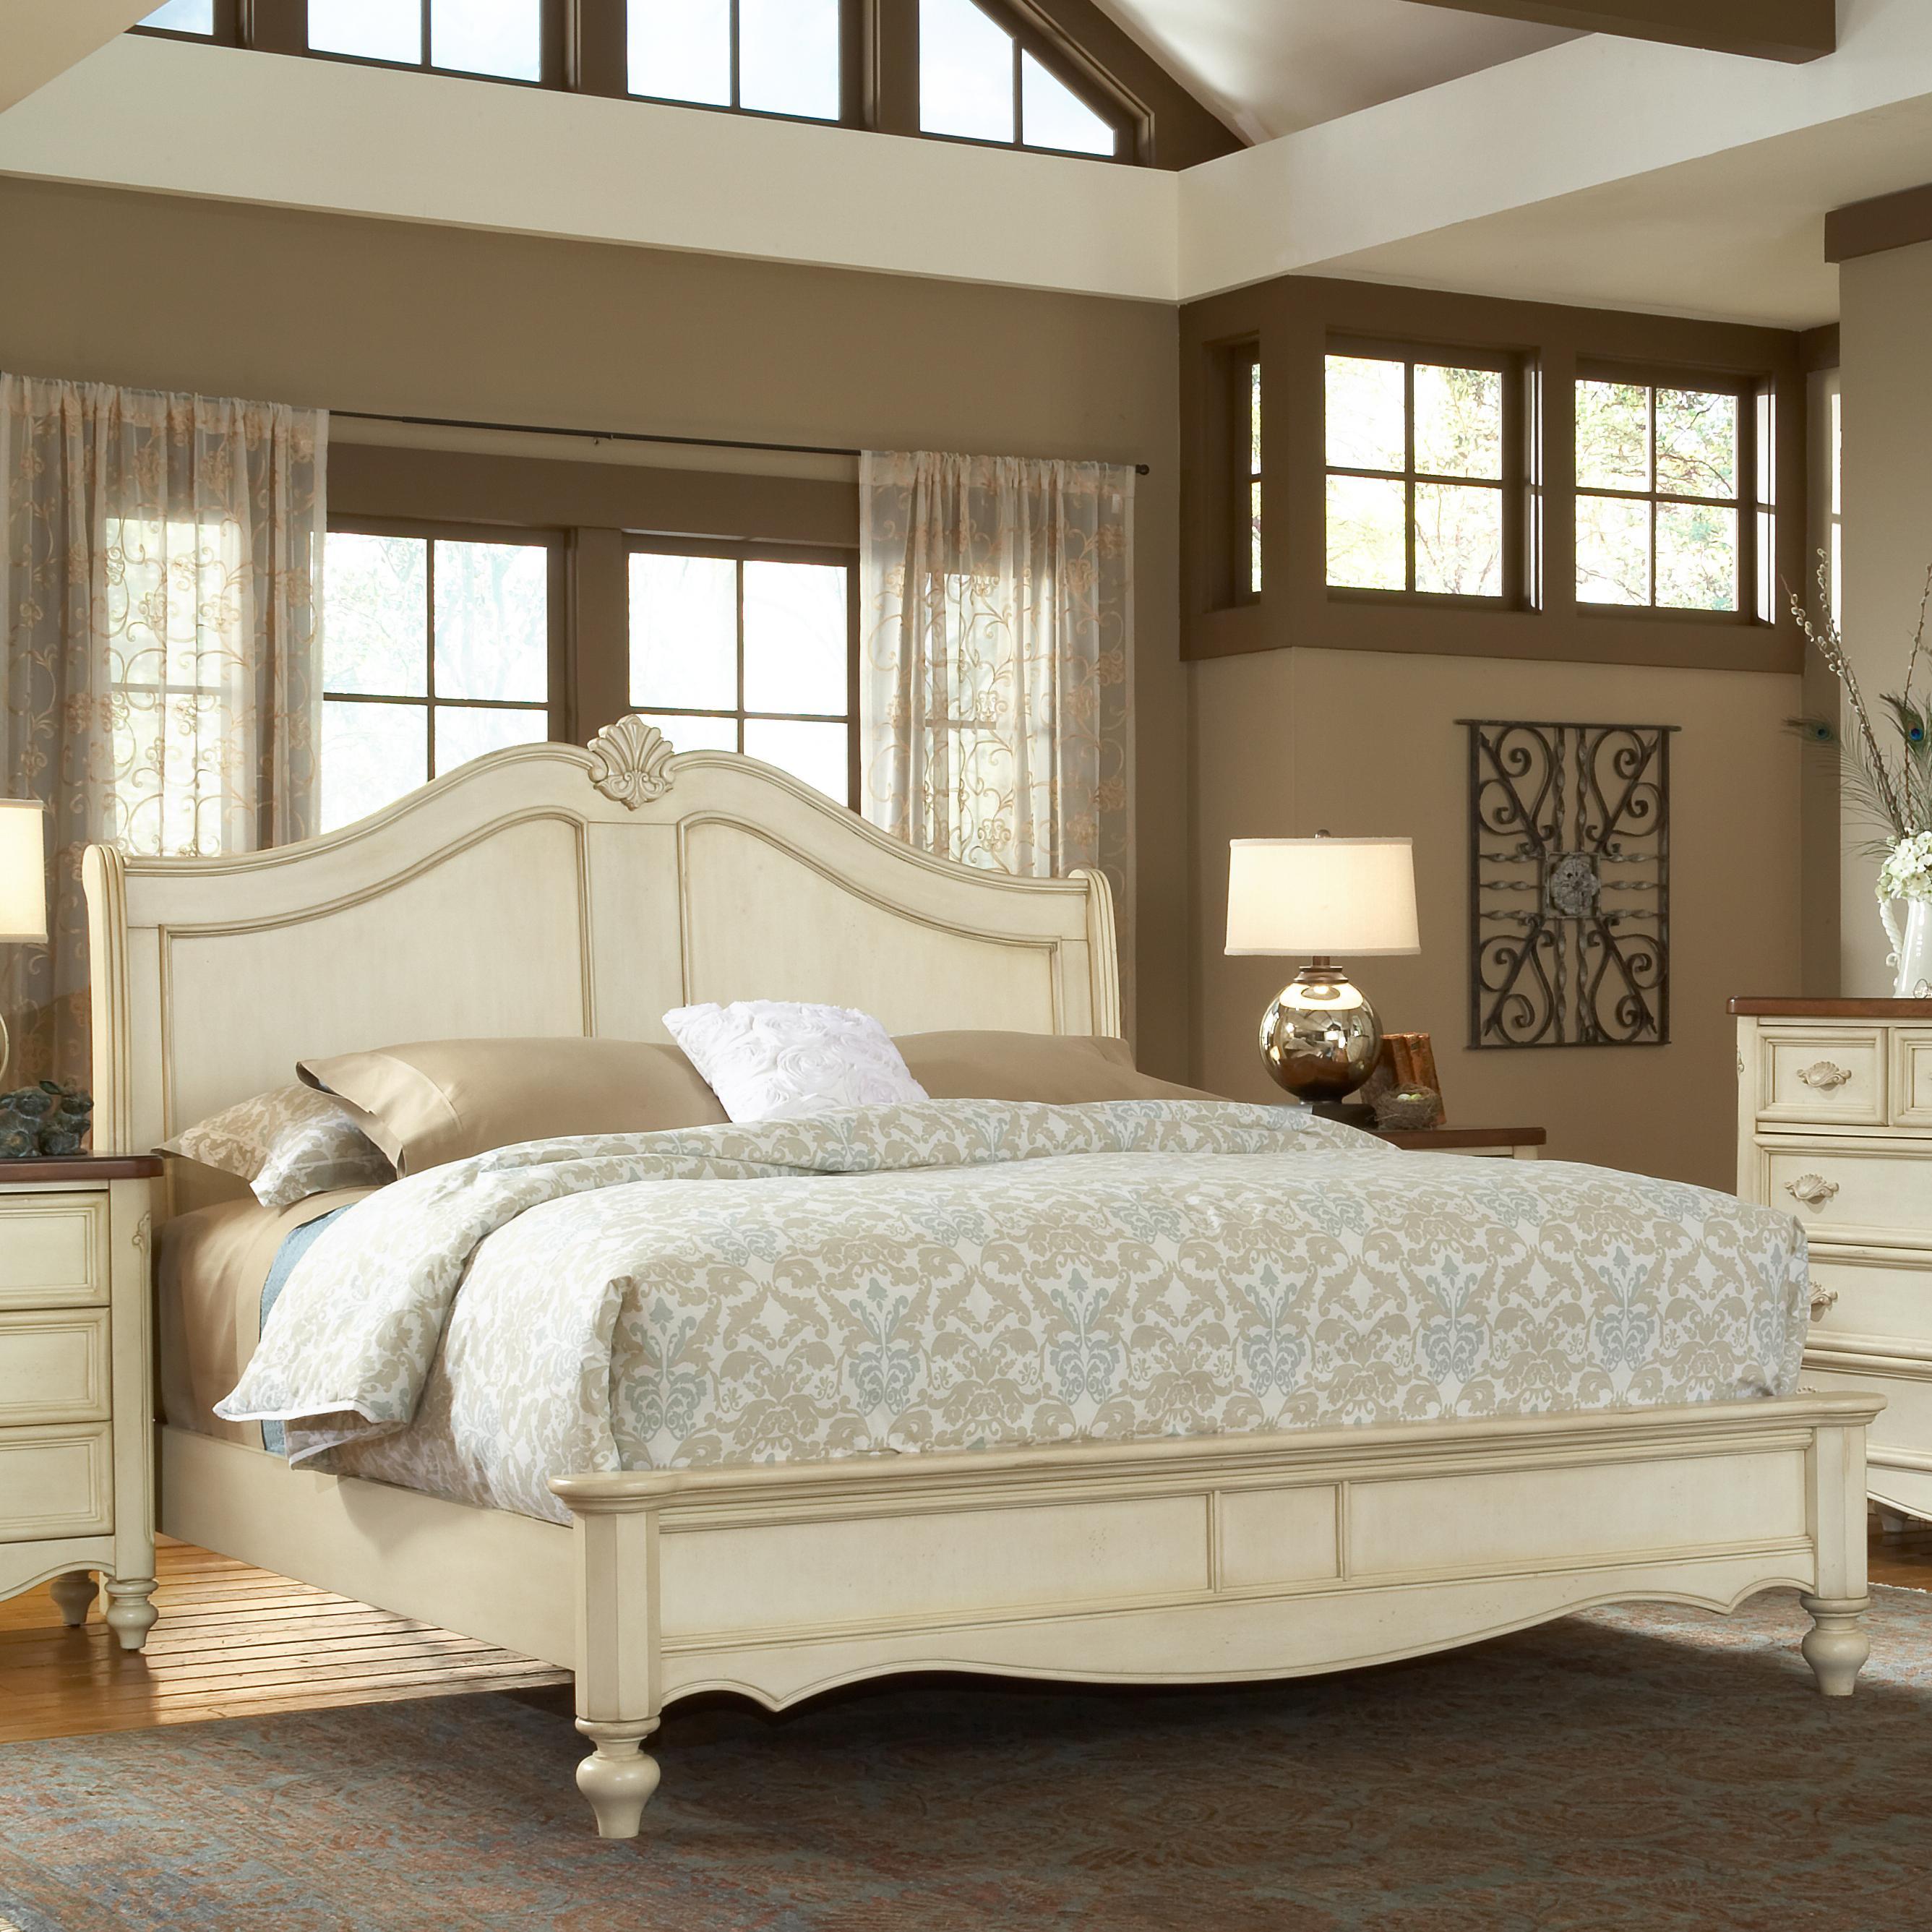 American Woodcrafters Chateau 3501 50sle Queen Size Fleur De Lis Headboard Bed Nassau